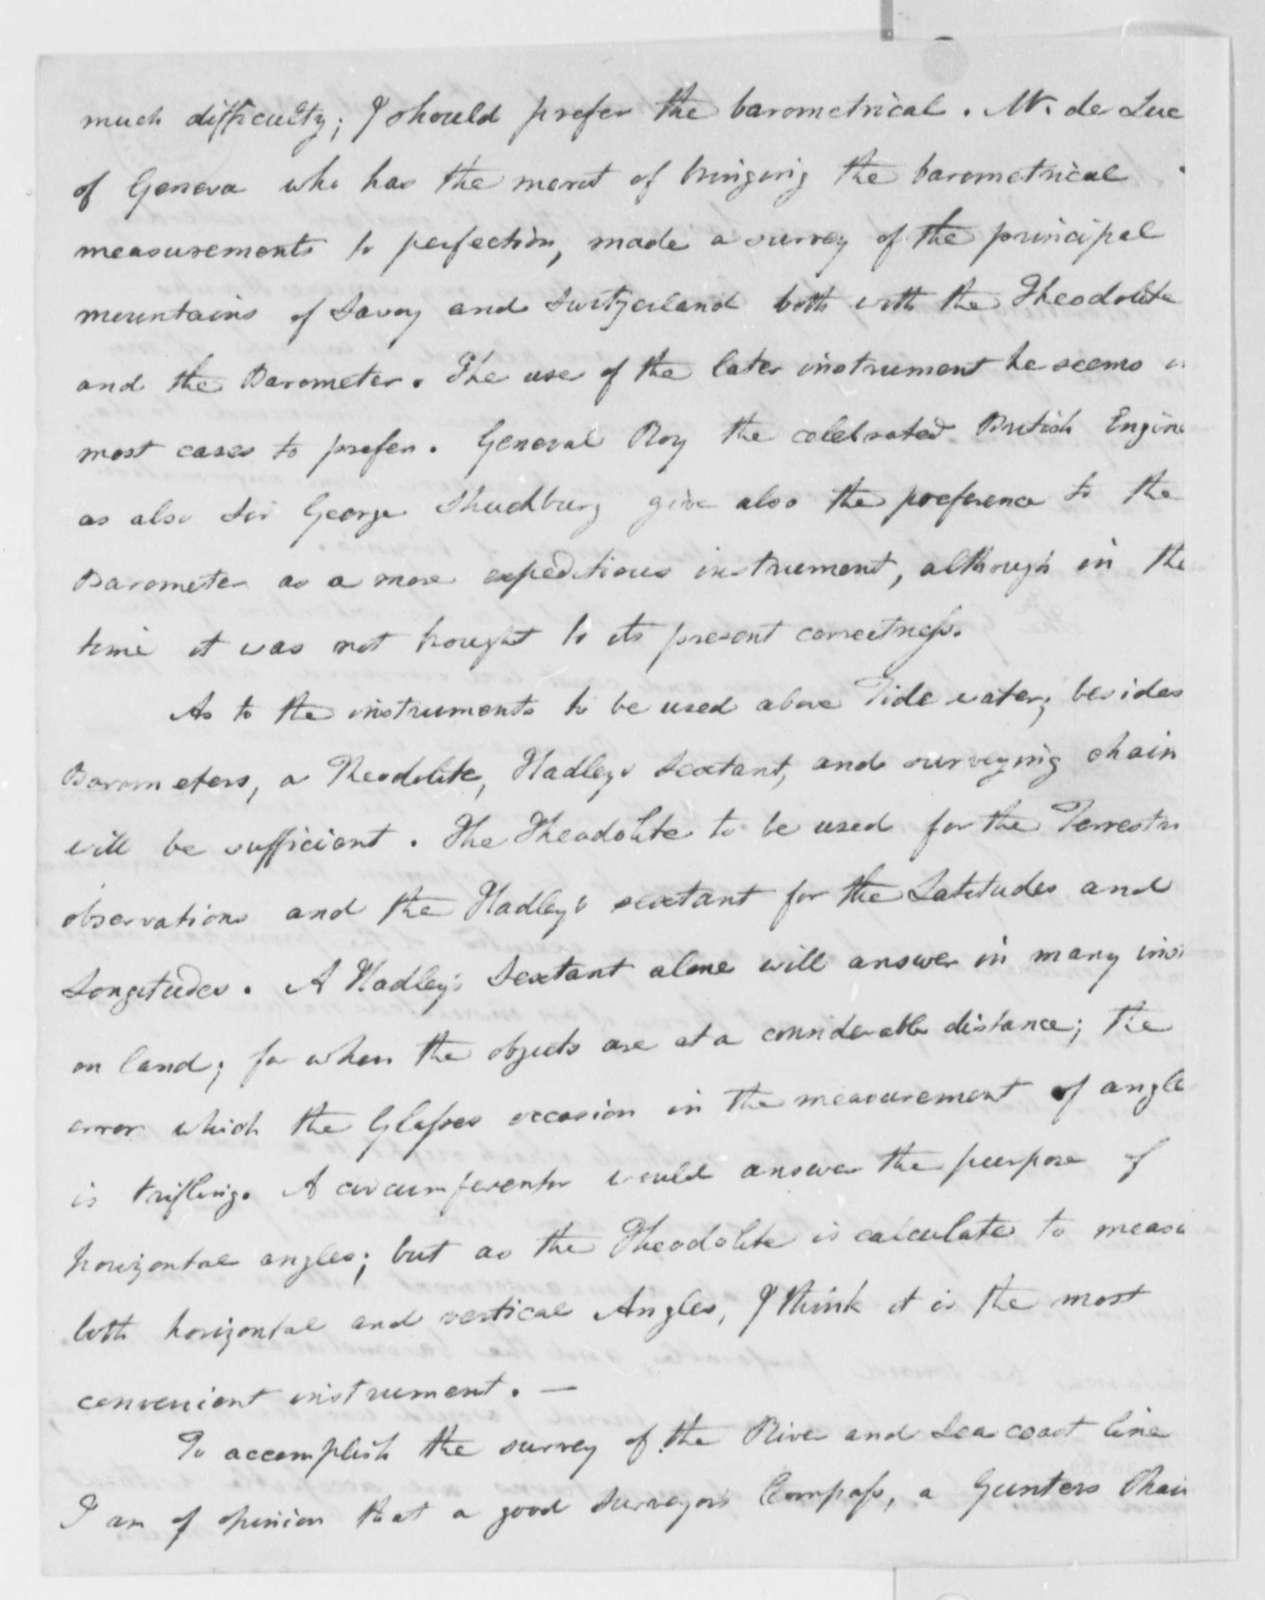 John Wood to Thomas Jefferson, April 6, 1816